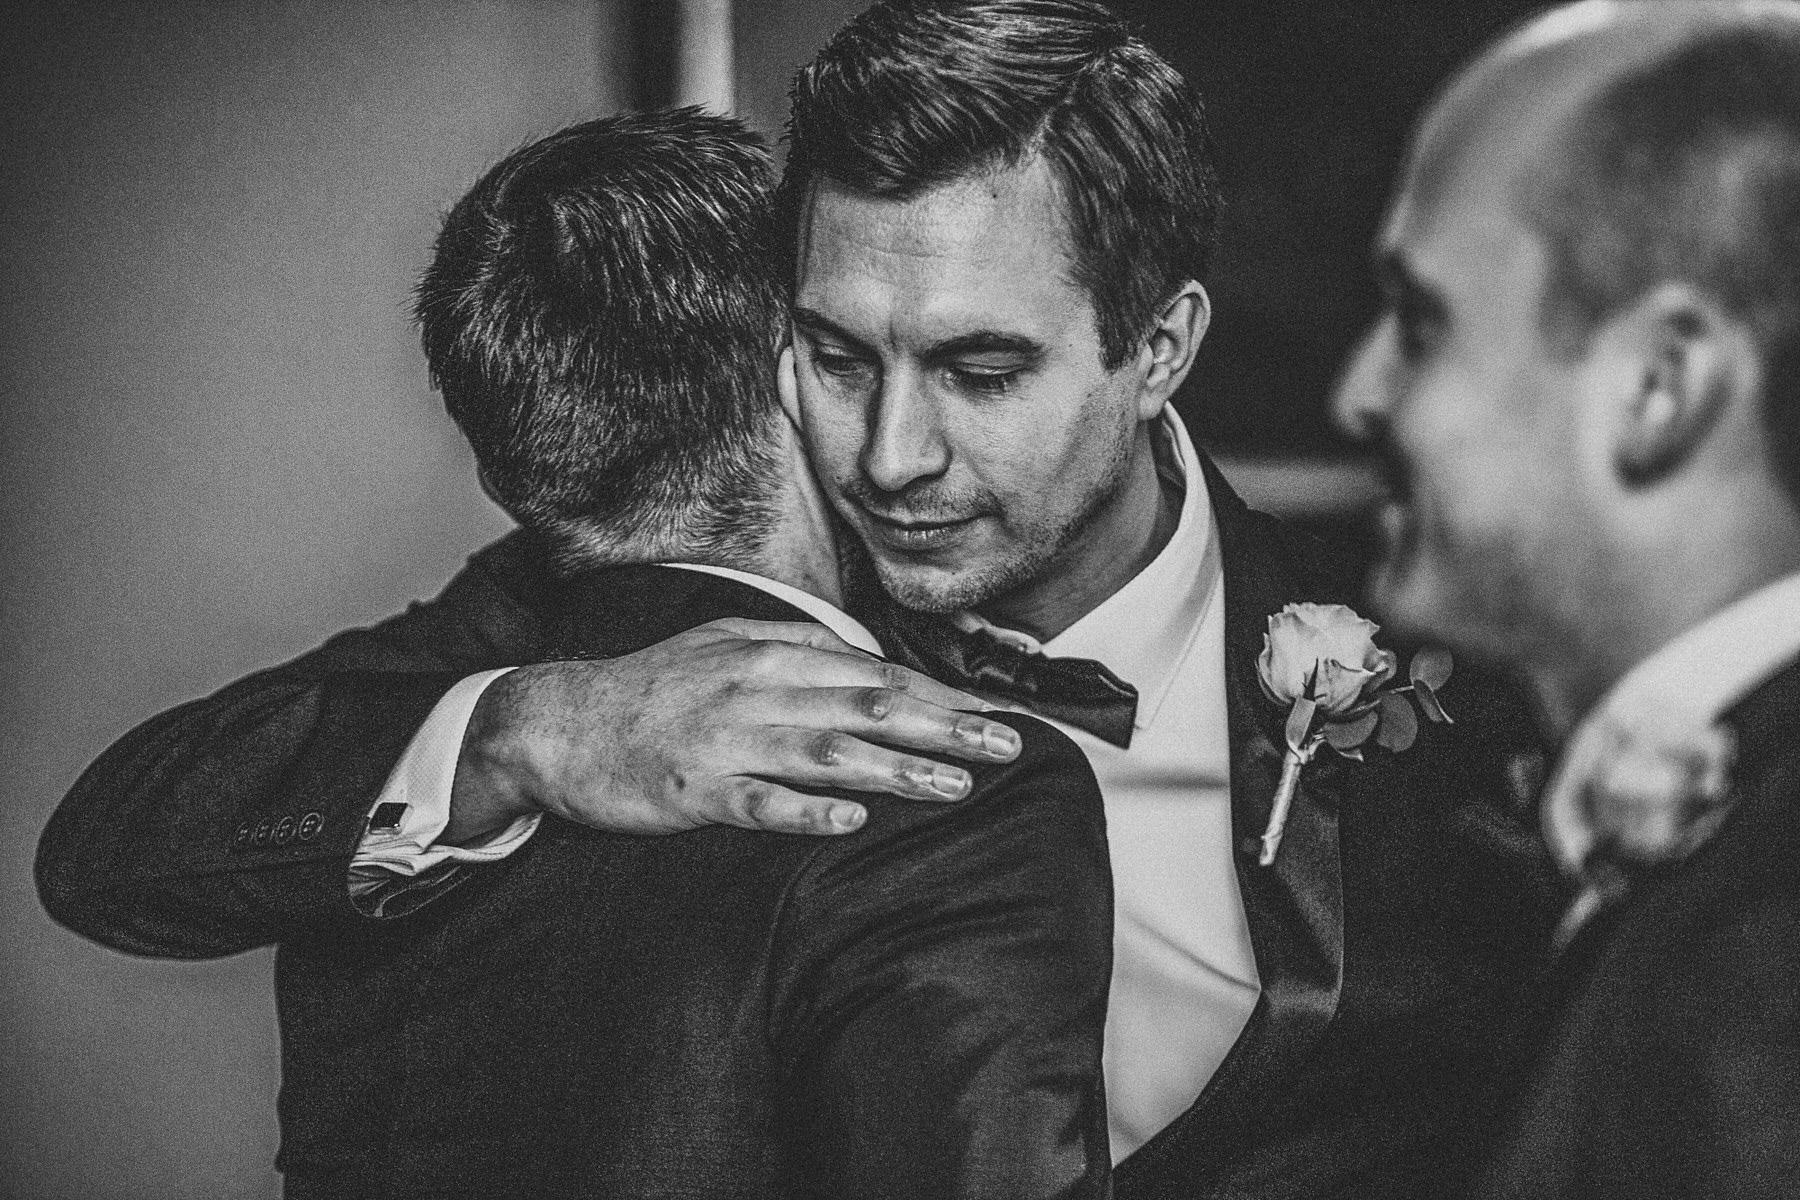 Wedding day hugs with groom and bestman